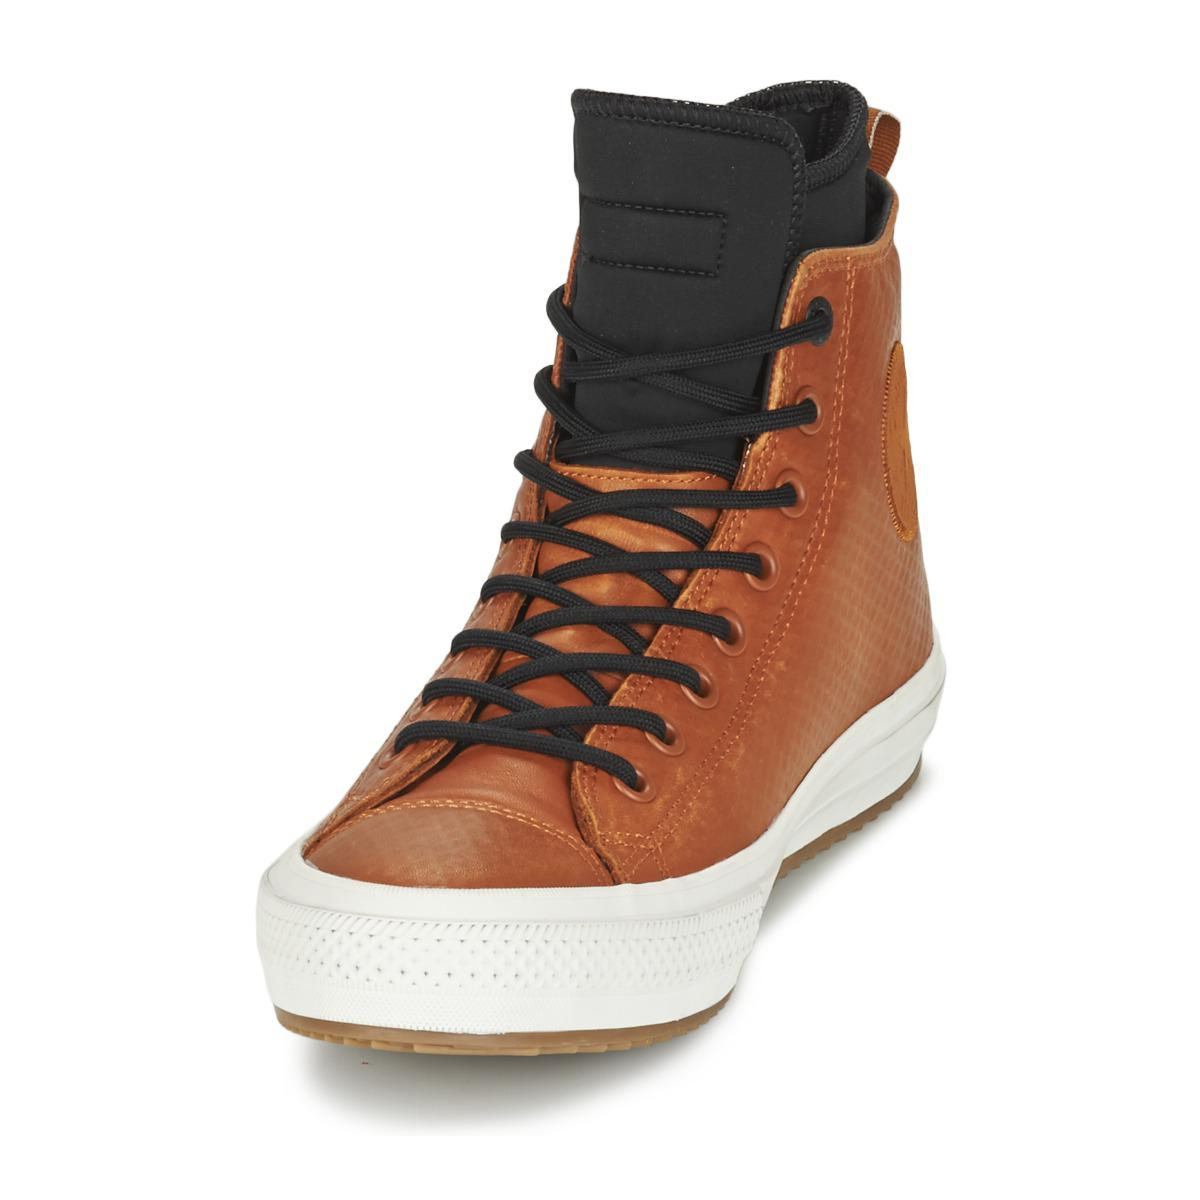 86f2a1bac2c0 CHUCK TAYLOR ALL STAR II BOOT CUIR / NEOPRENE HI femmes Chaussures ...